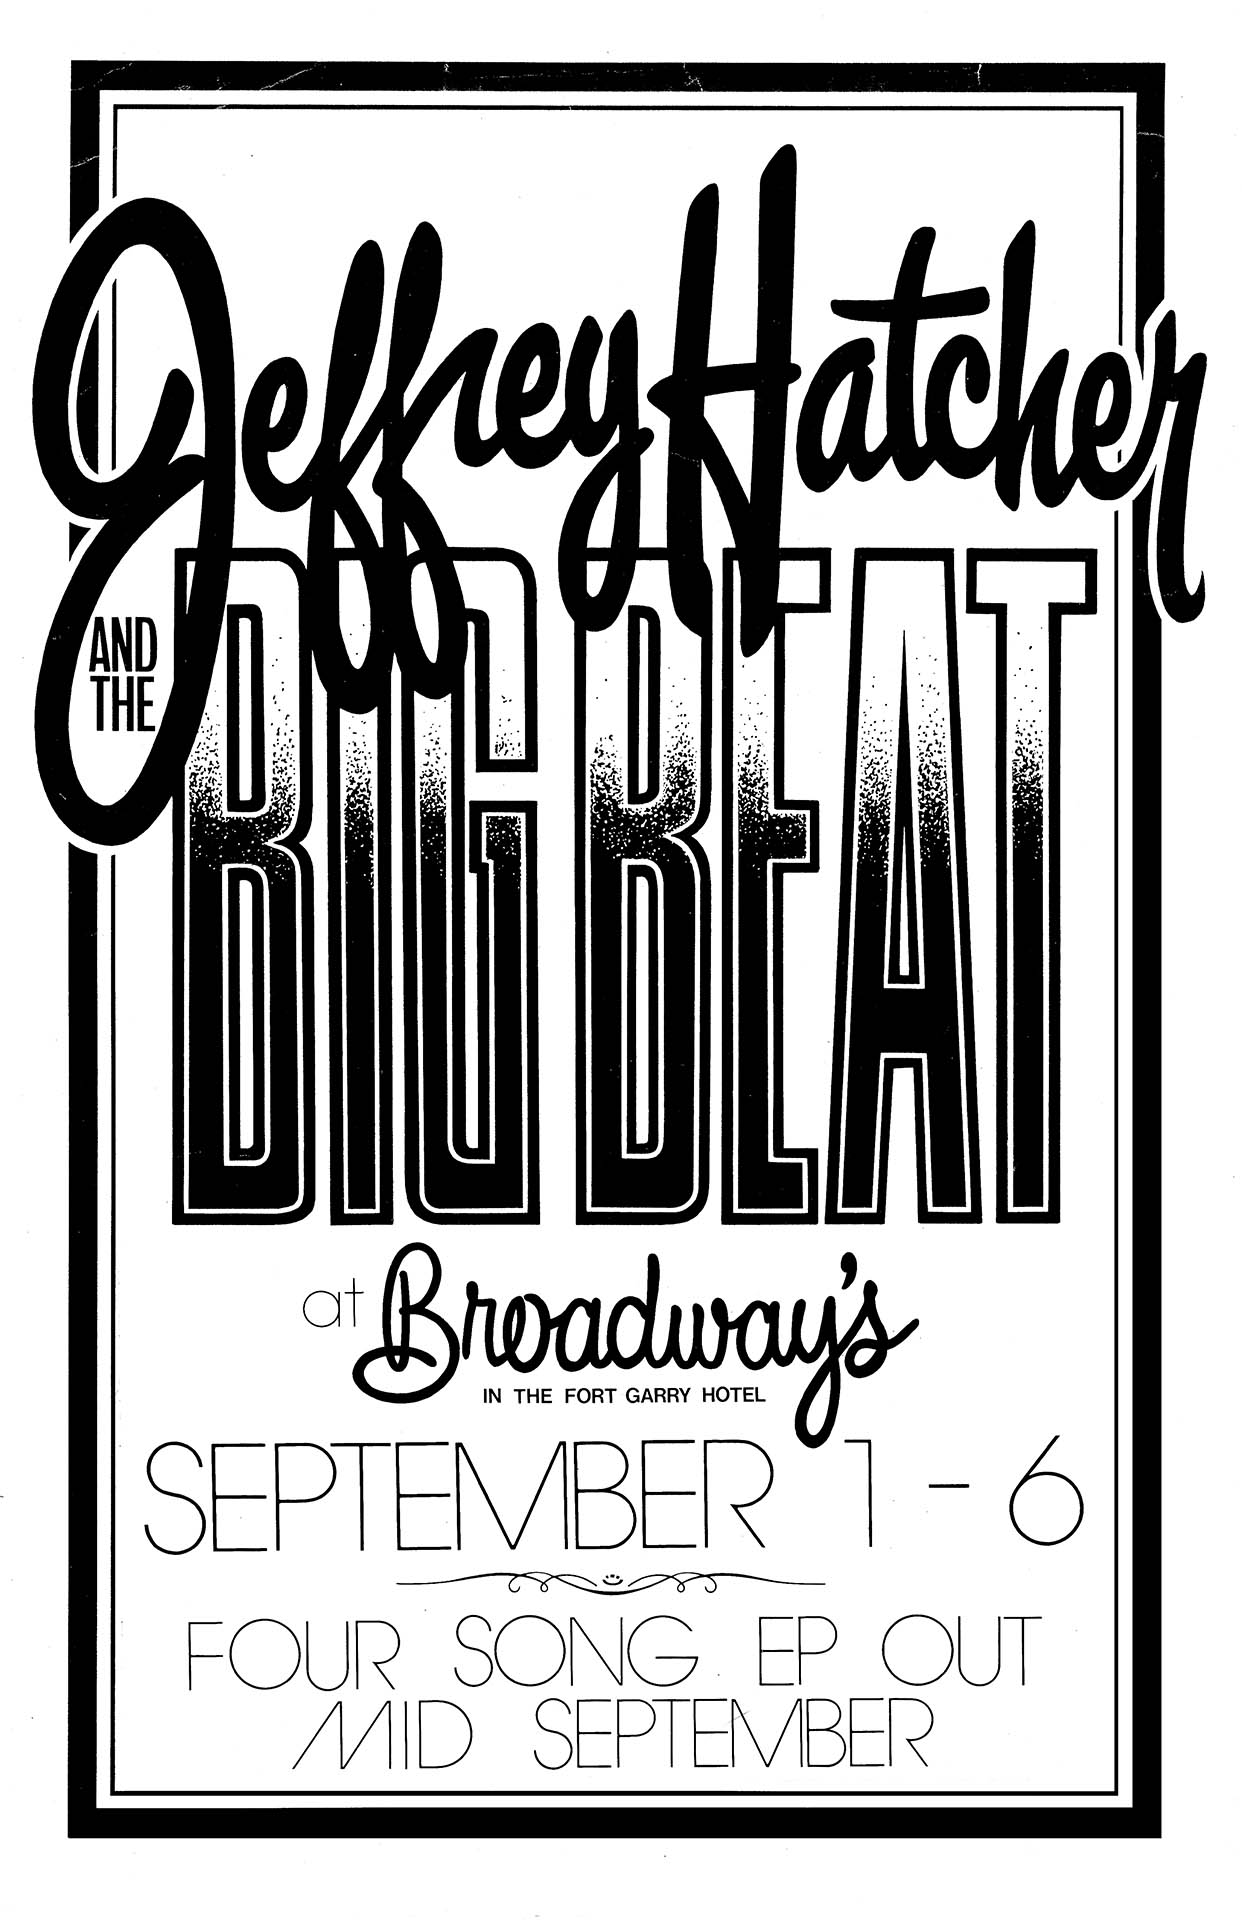 JEFFREY HATCHER & THE BIG BEAT – 1986